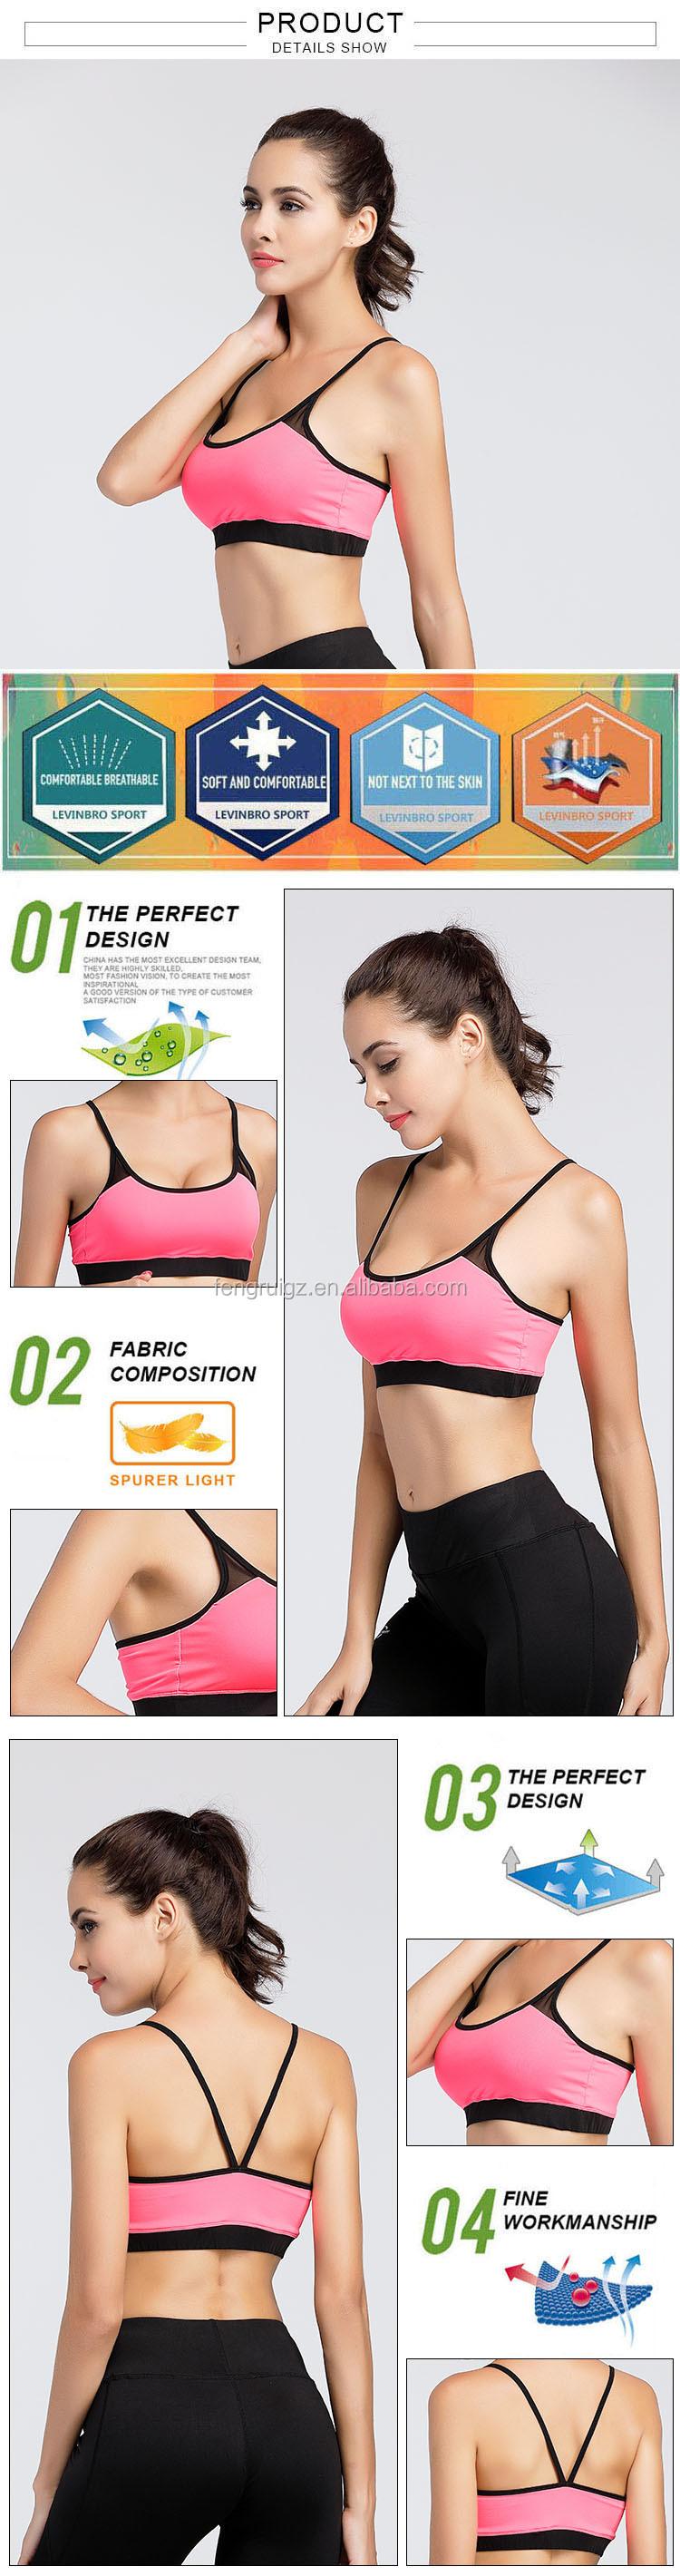 dca92b9ecf Sexy bra and panty new design spandex   polyester material genie sports bra